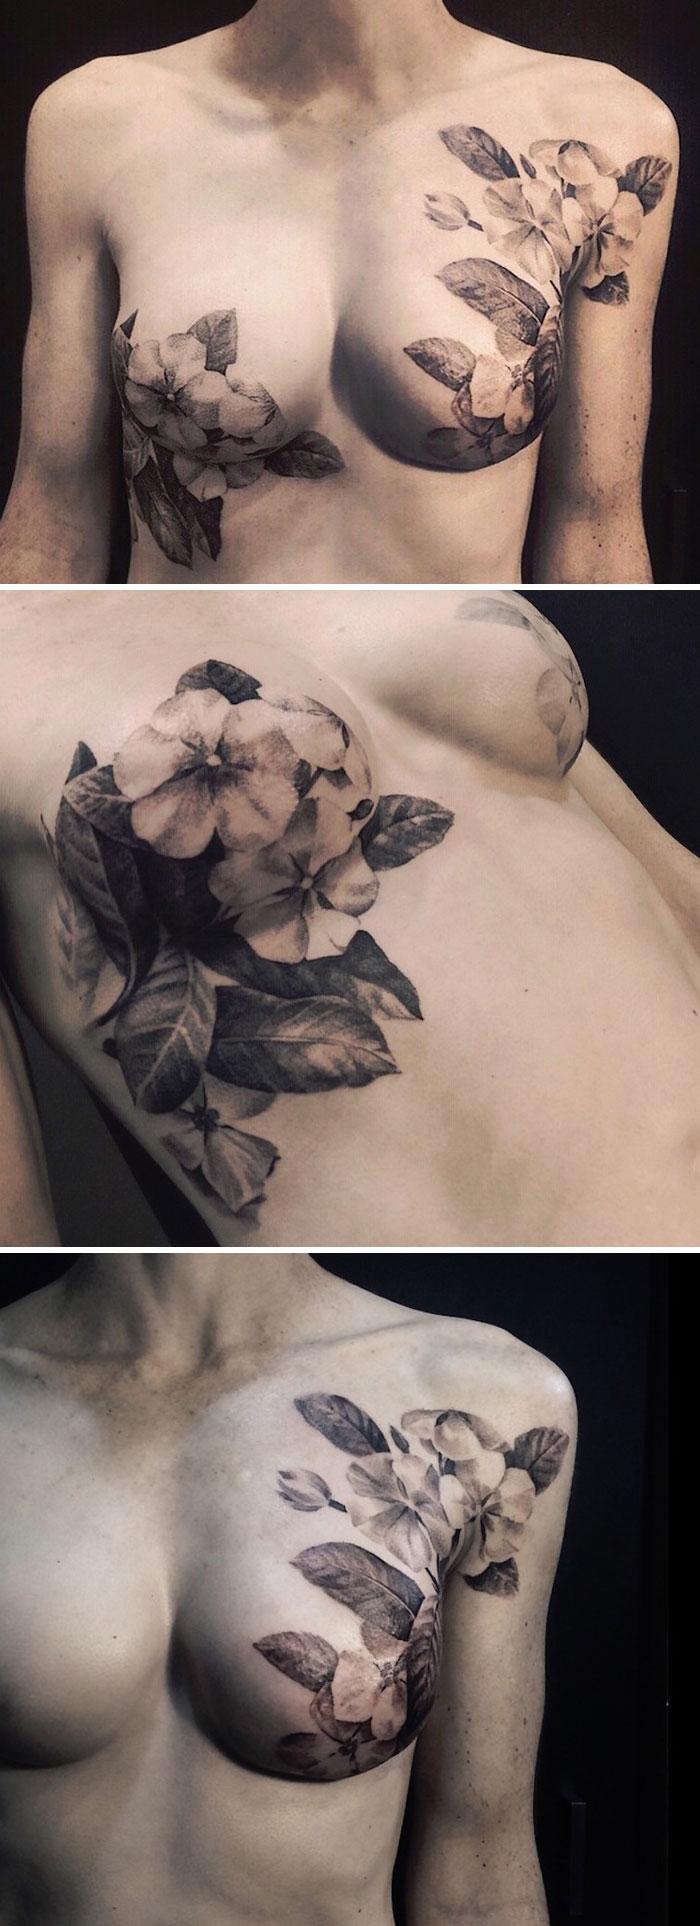 floral-tattoo-artists-12-58e254ca6c03c__700